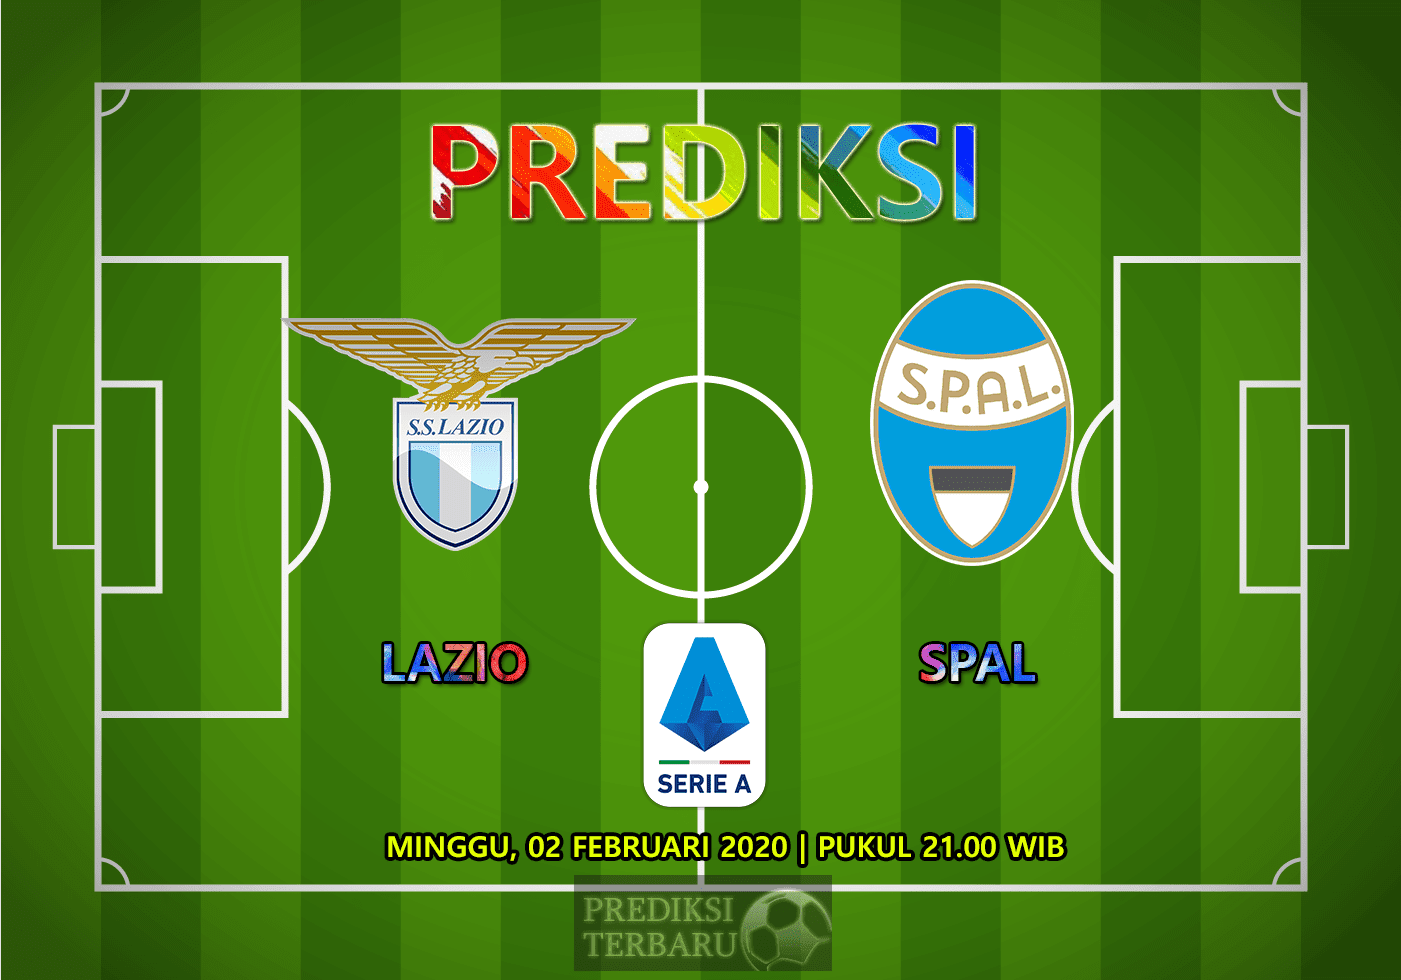 Prediksi Lazio Vs Spal 02 Februari